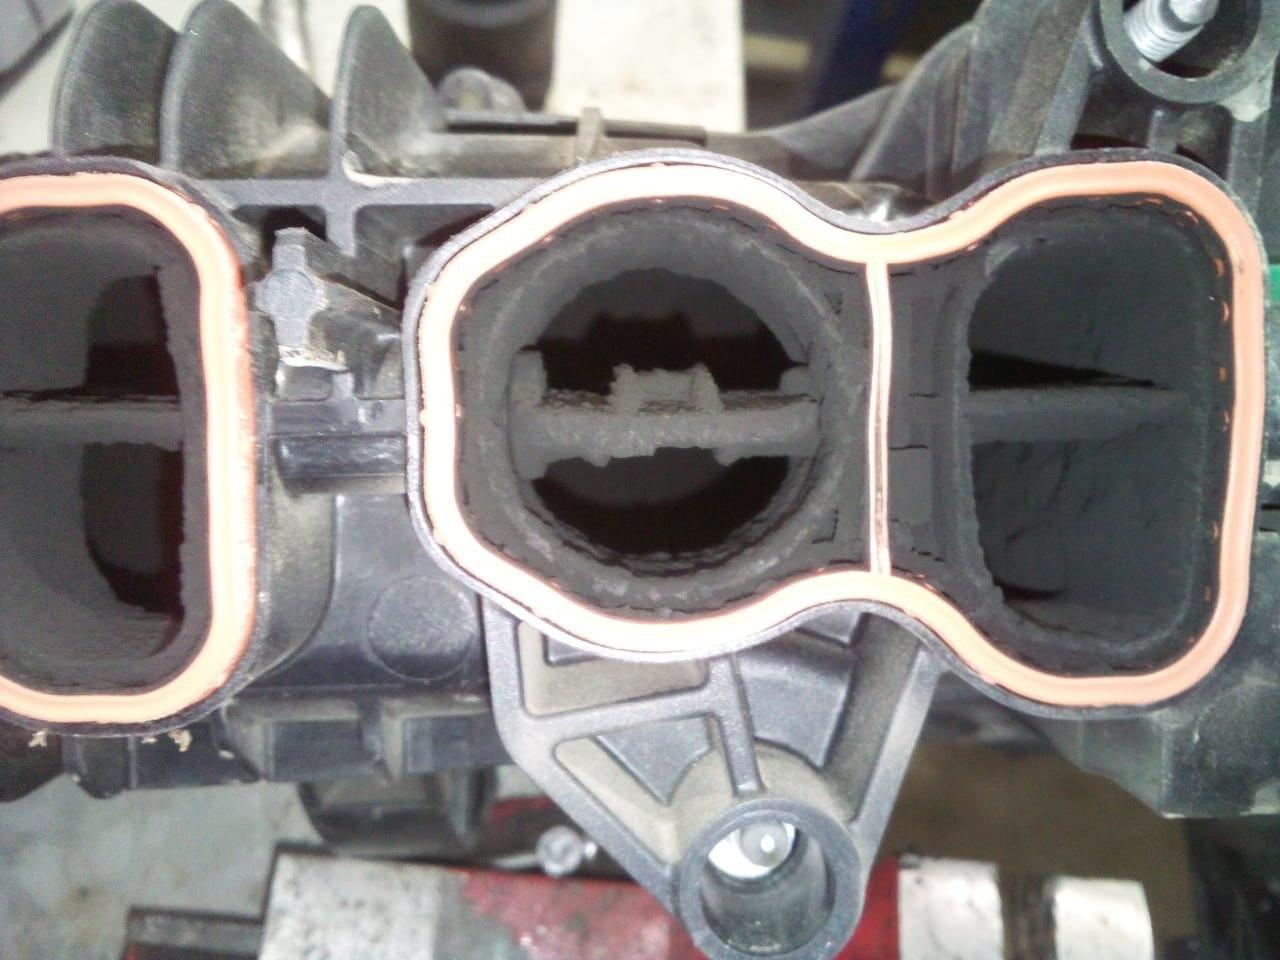 Впускной коллектор двигателя N57 до чистки